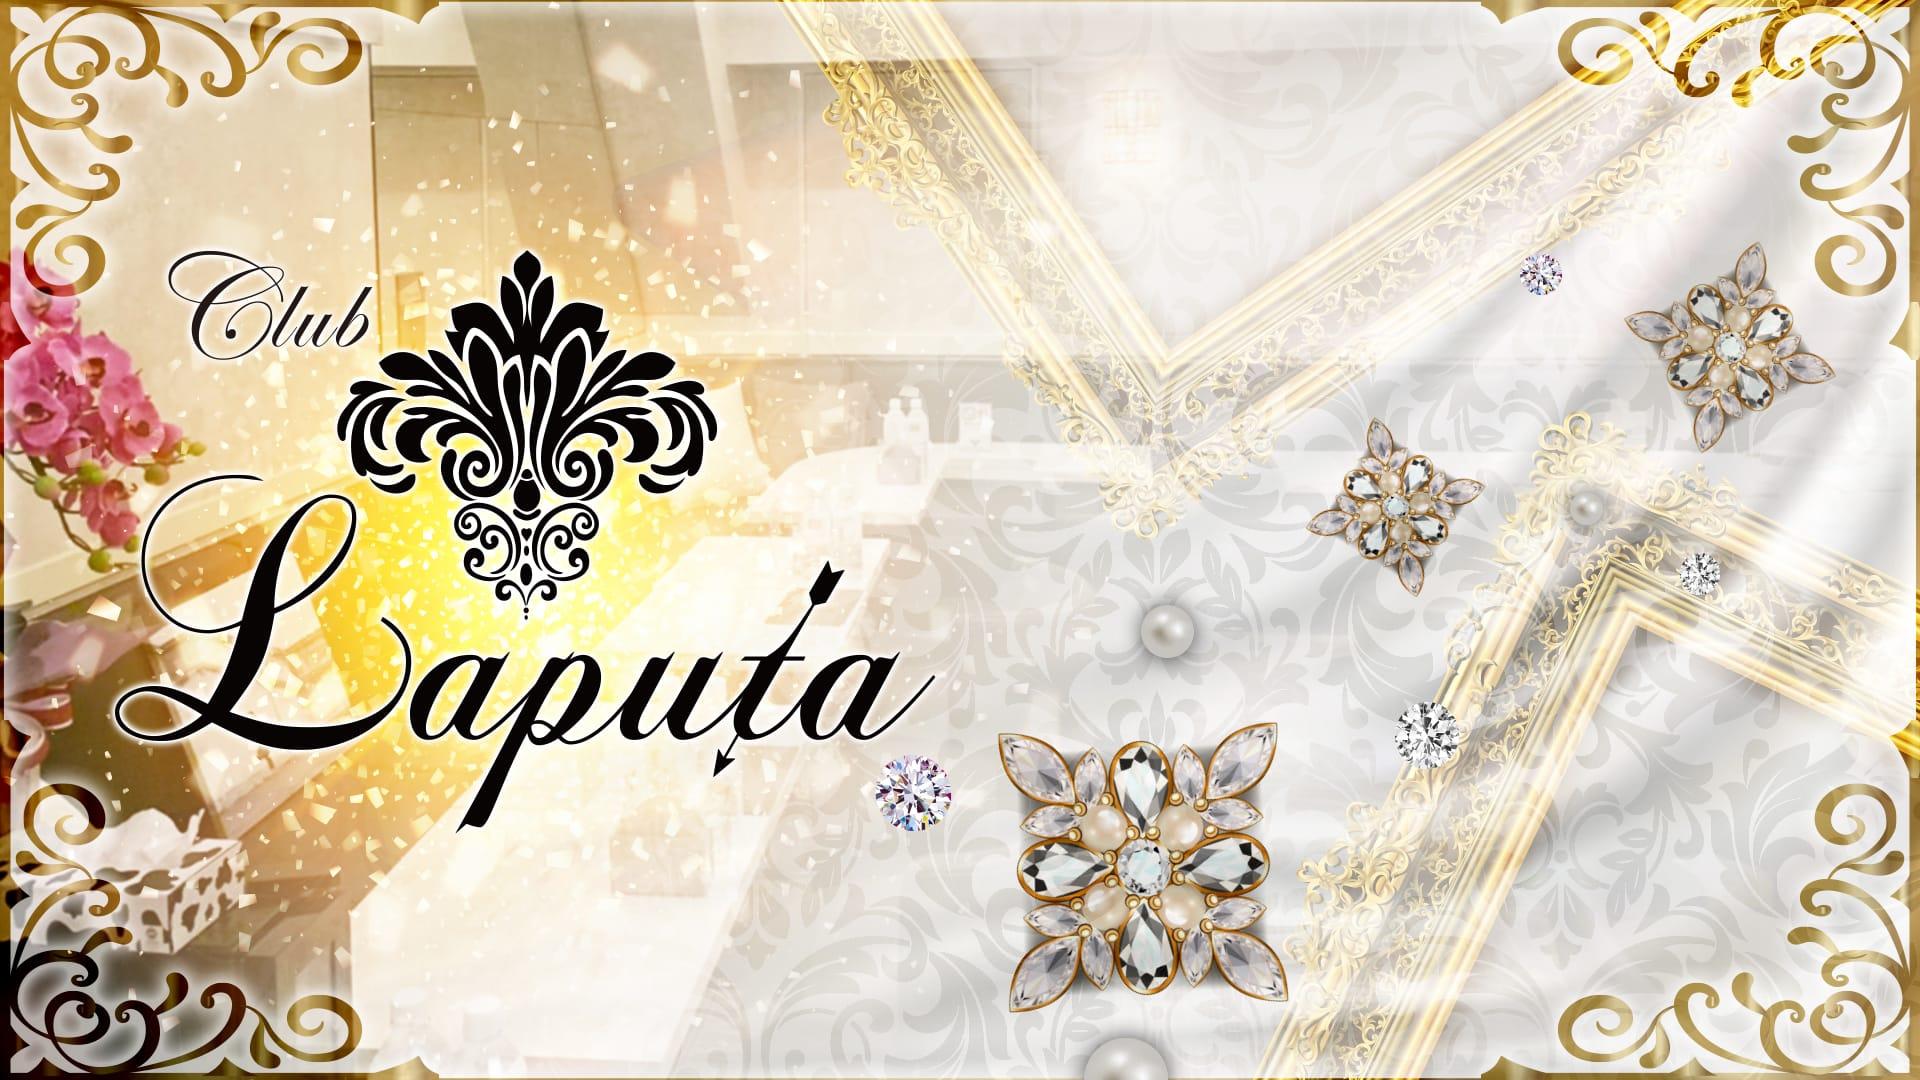 Club LAPUTA(ラピュタ) 上野キャバクラ TOP画像